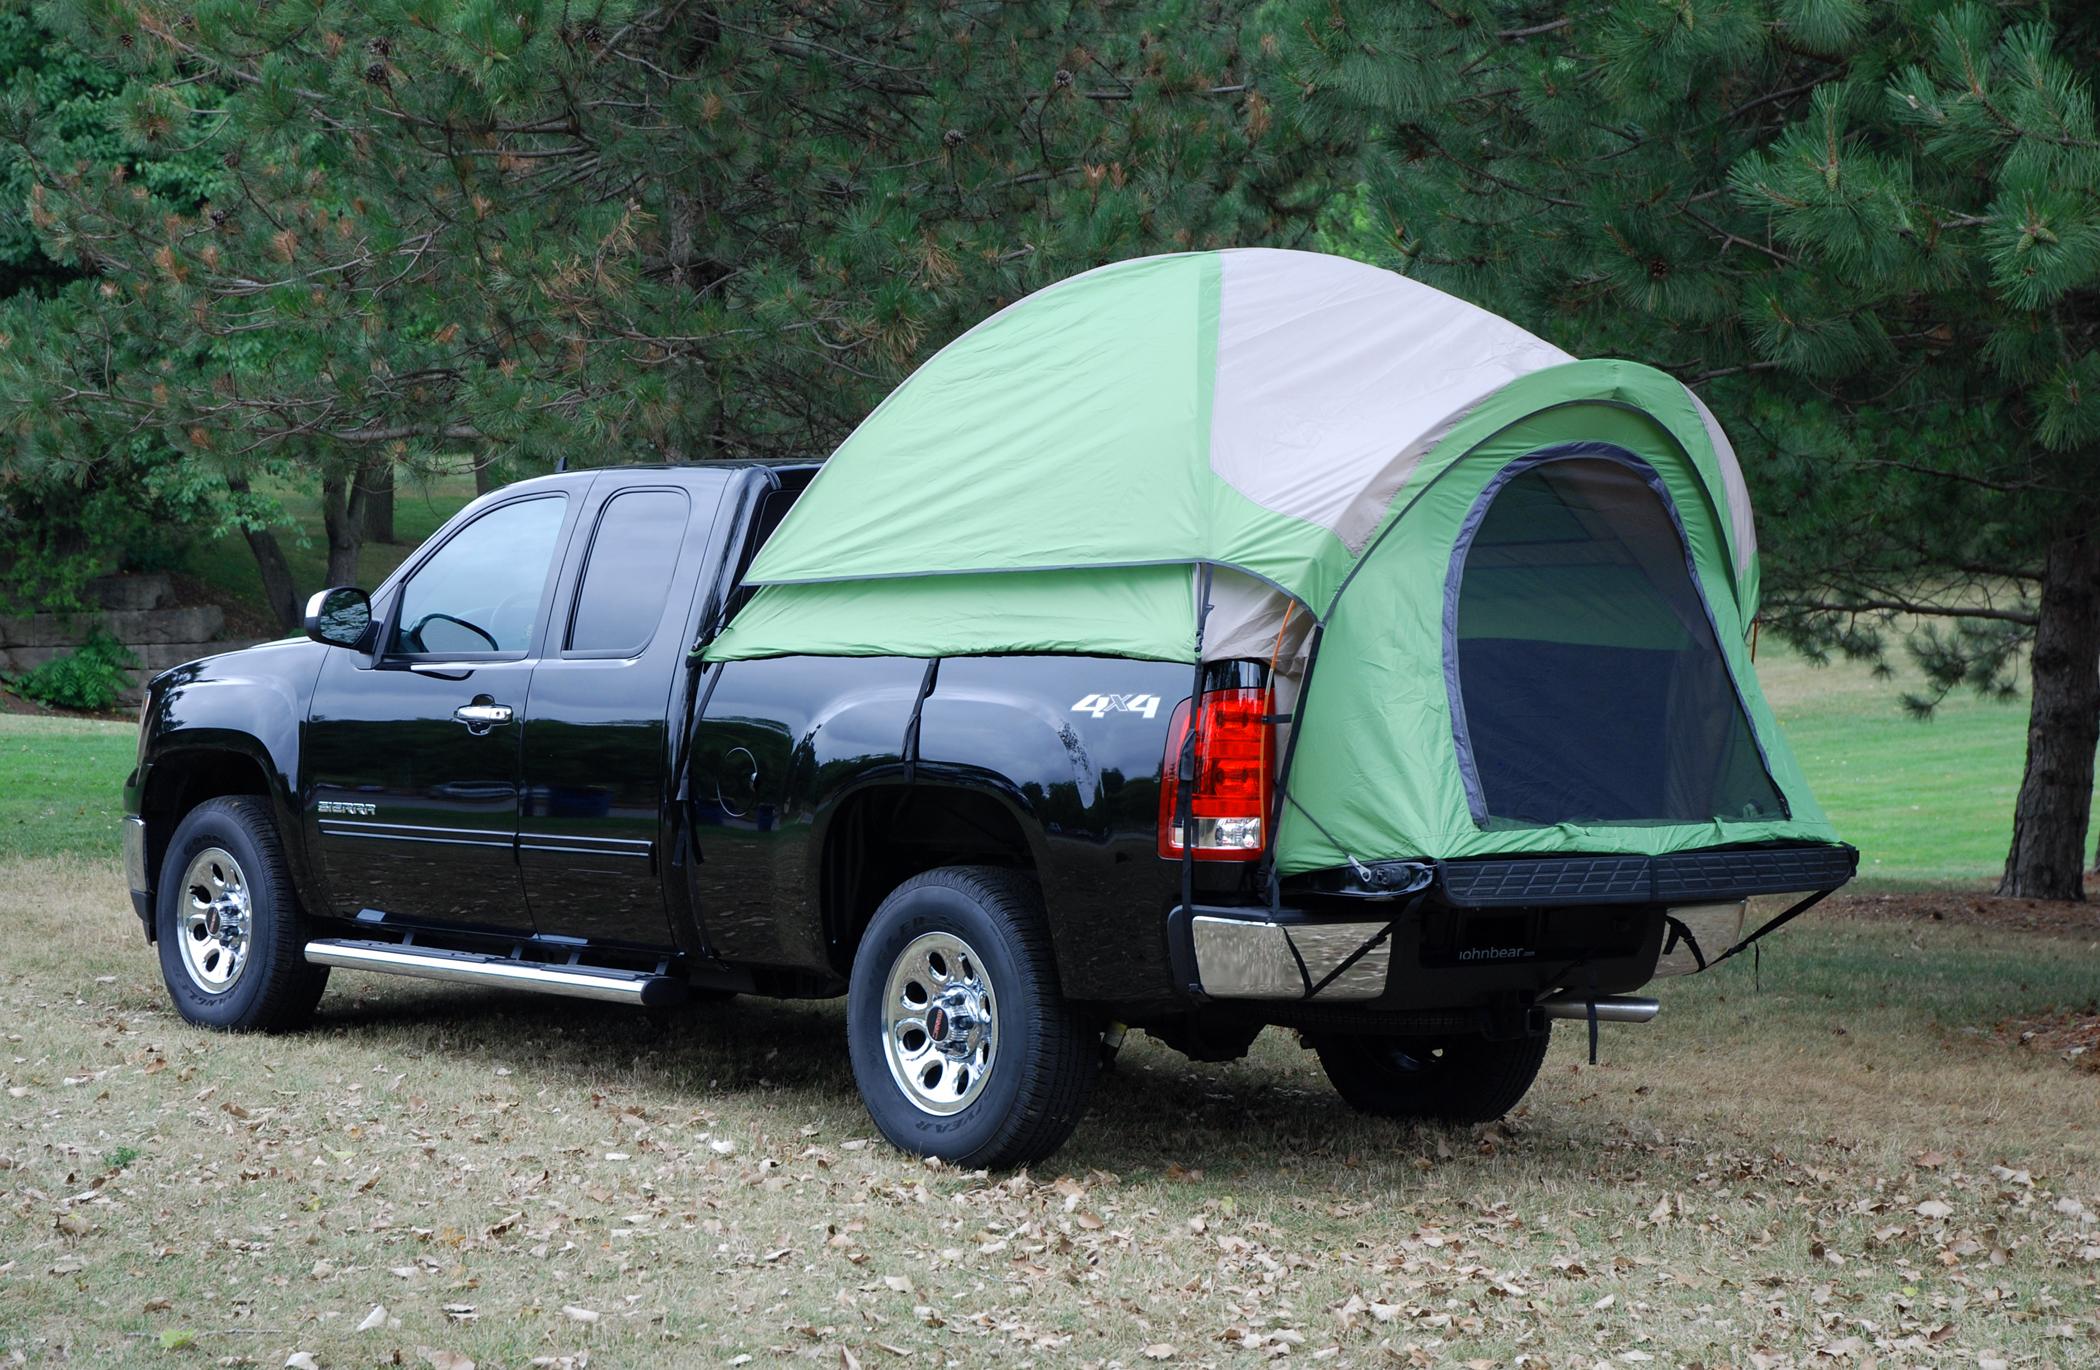 Napier Outdoors Backroadz #13 Compact Short Box Truck Tent 6Ft. & Outdoors Backroadz #13 Compact Short Box Truck Tent 6Ft.